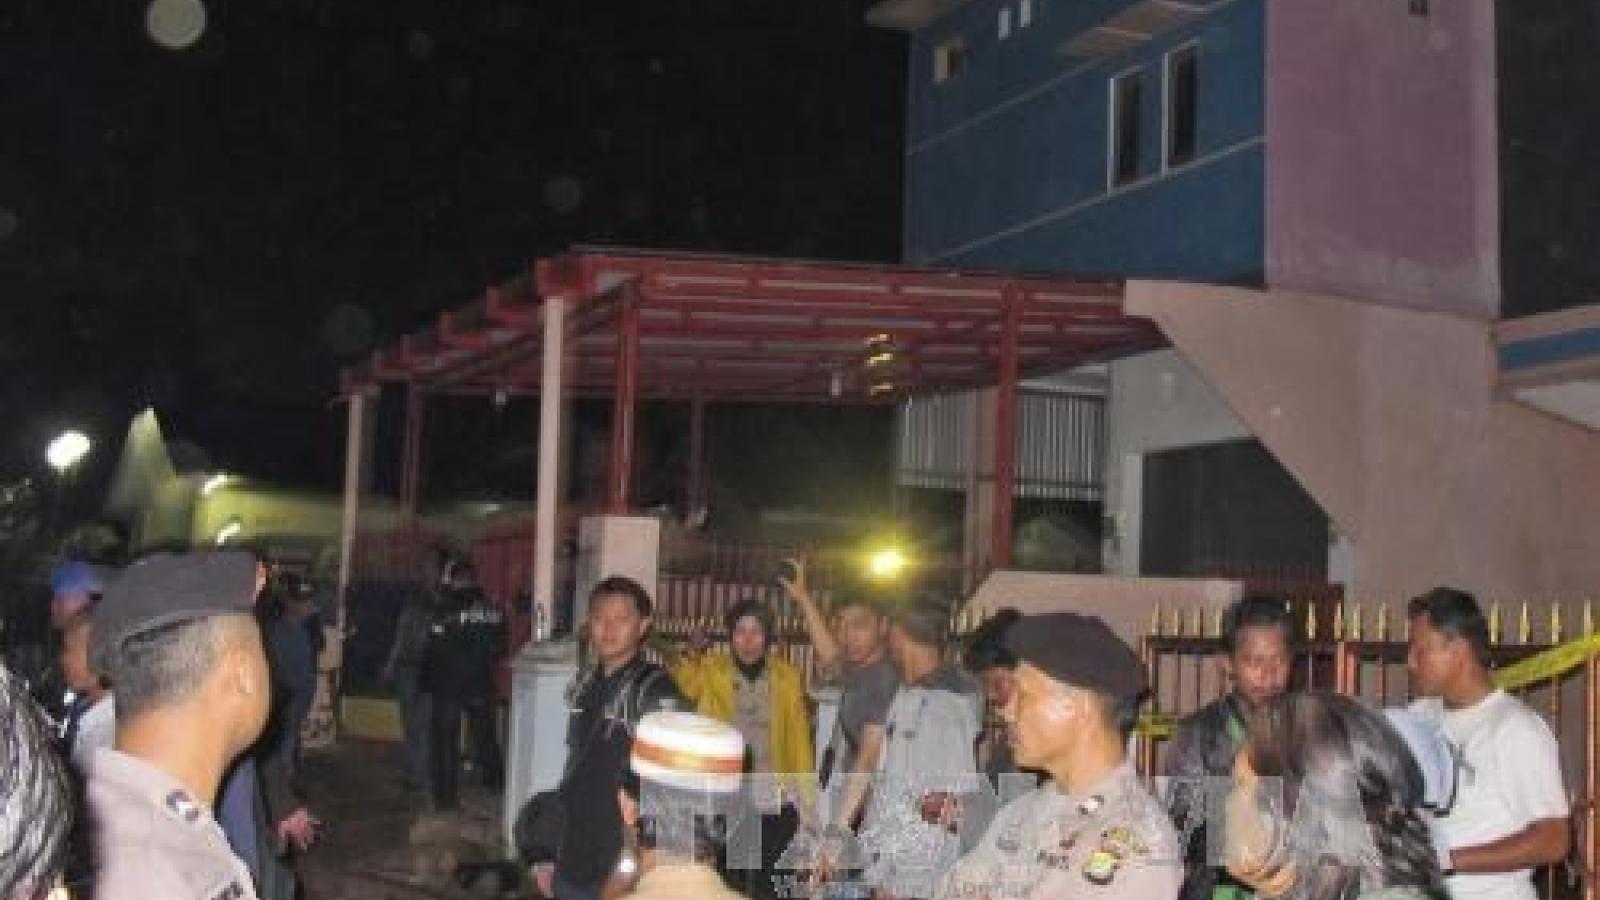 Indonesian police evacuates Jakarta's outskirts due to bomb